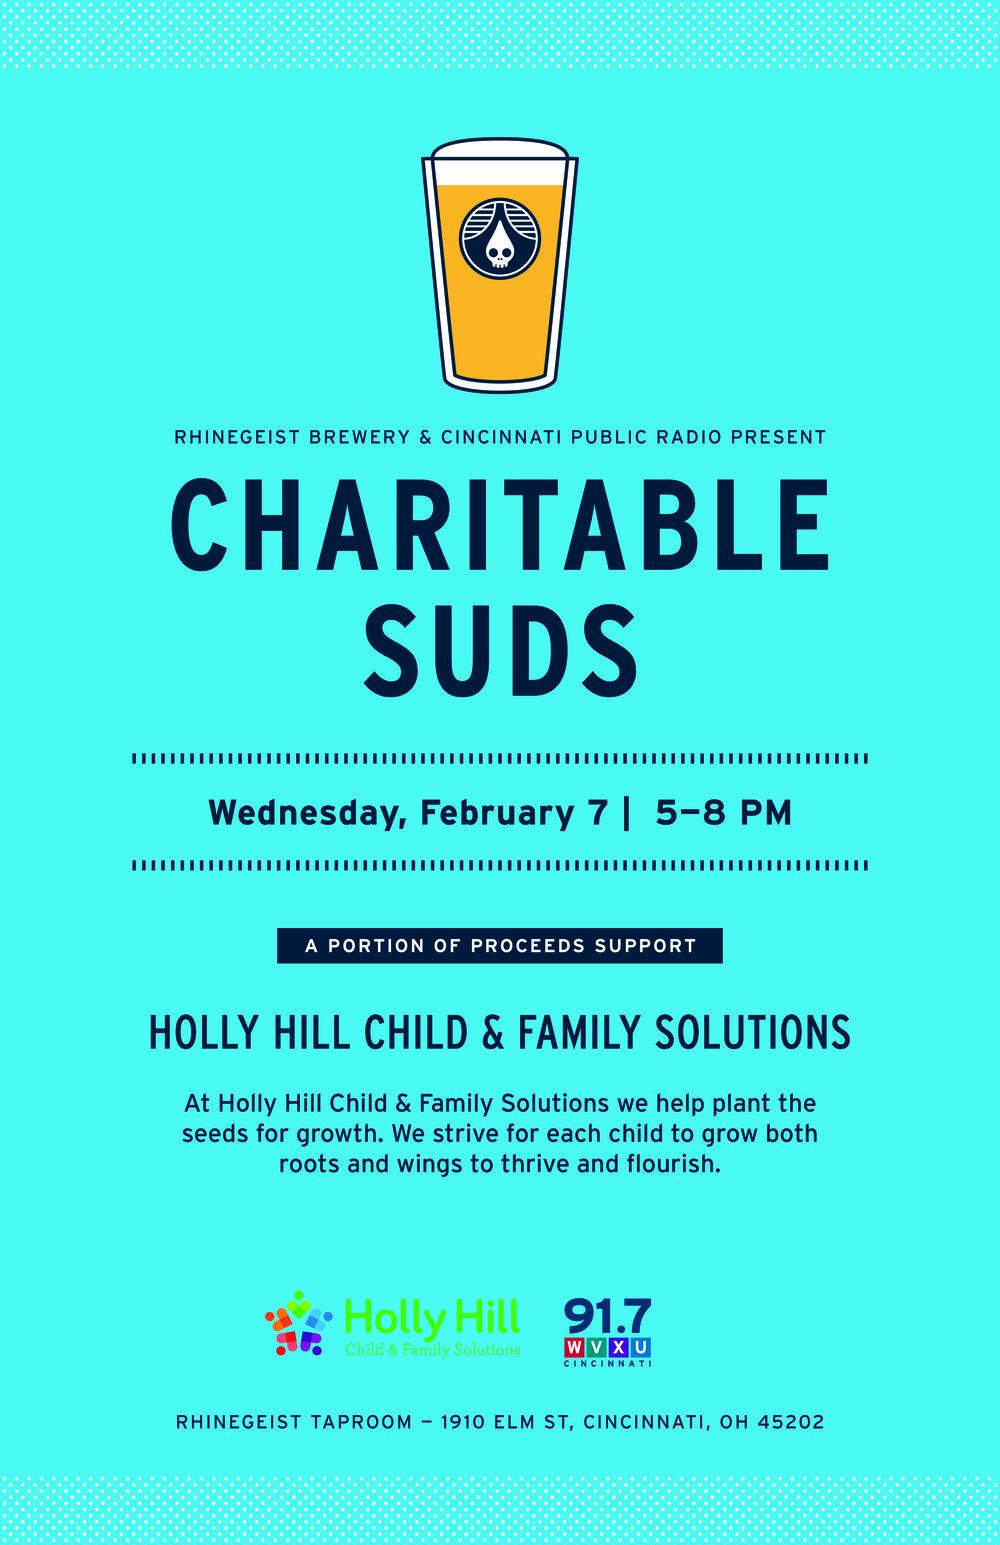 CharitableSuds_HollyHill_Poster-01.jpg